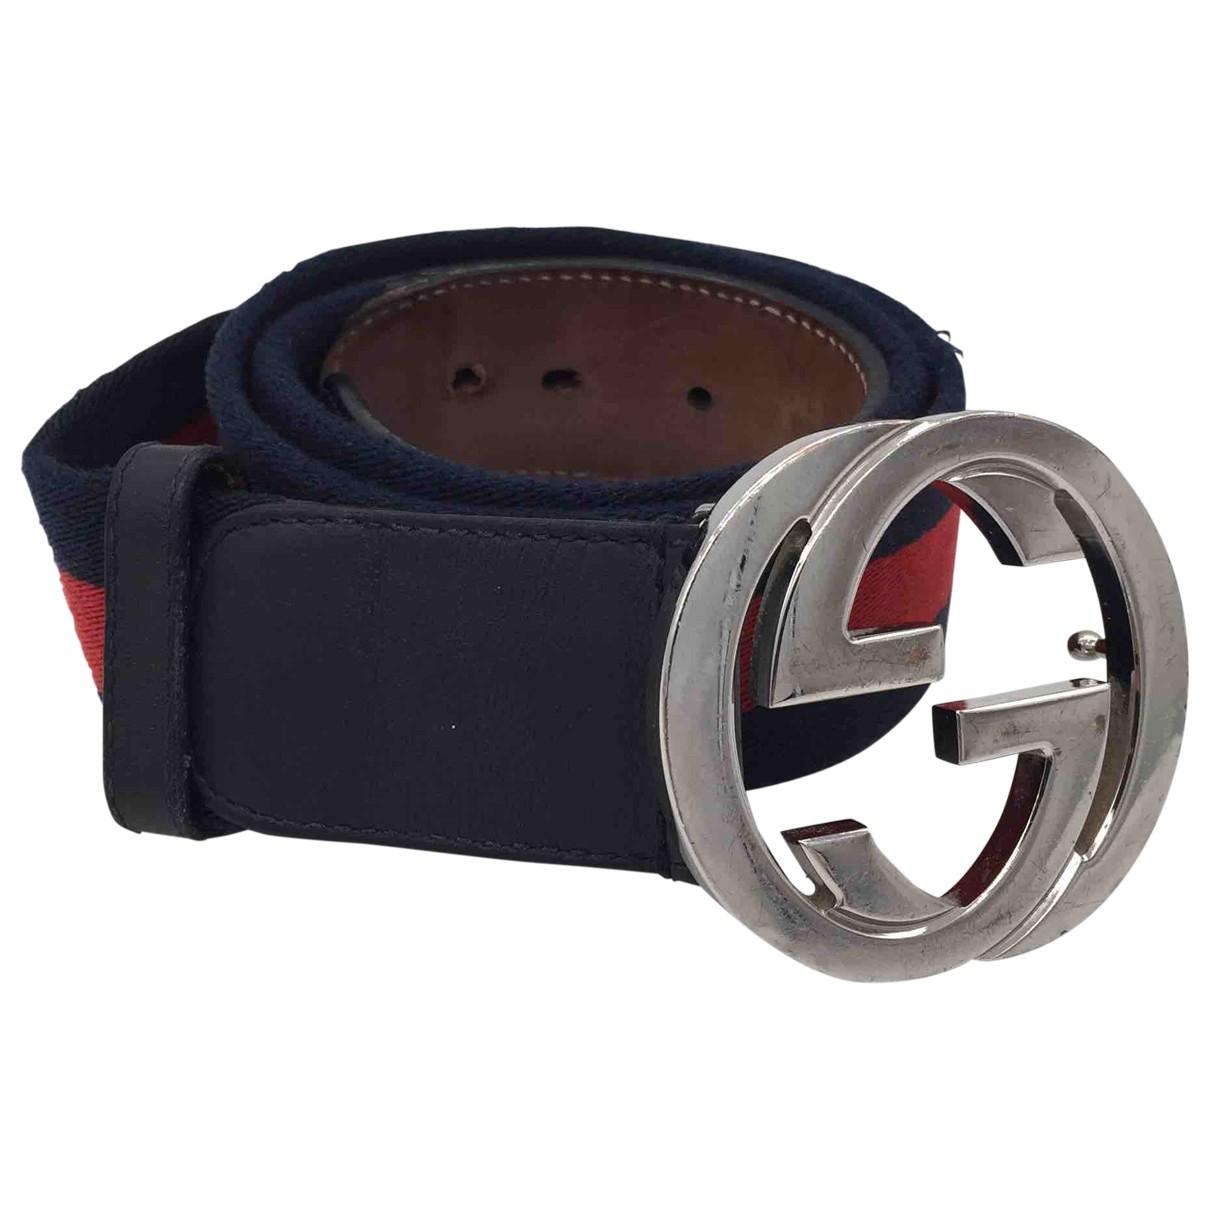 Gucci Interlocking Buckle Cloth belt for Men 85 cm